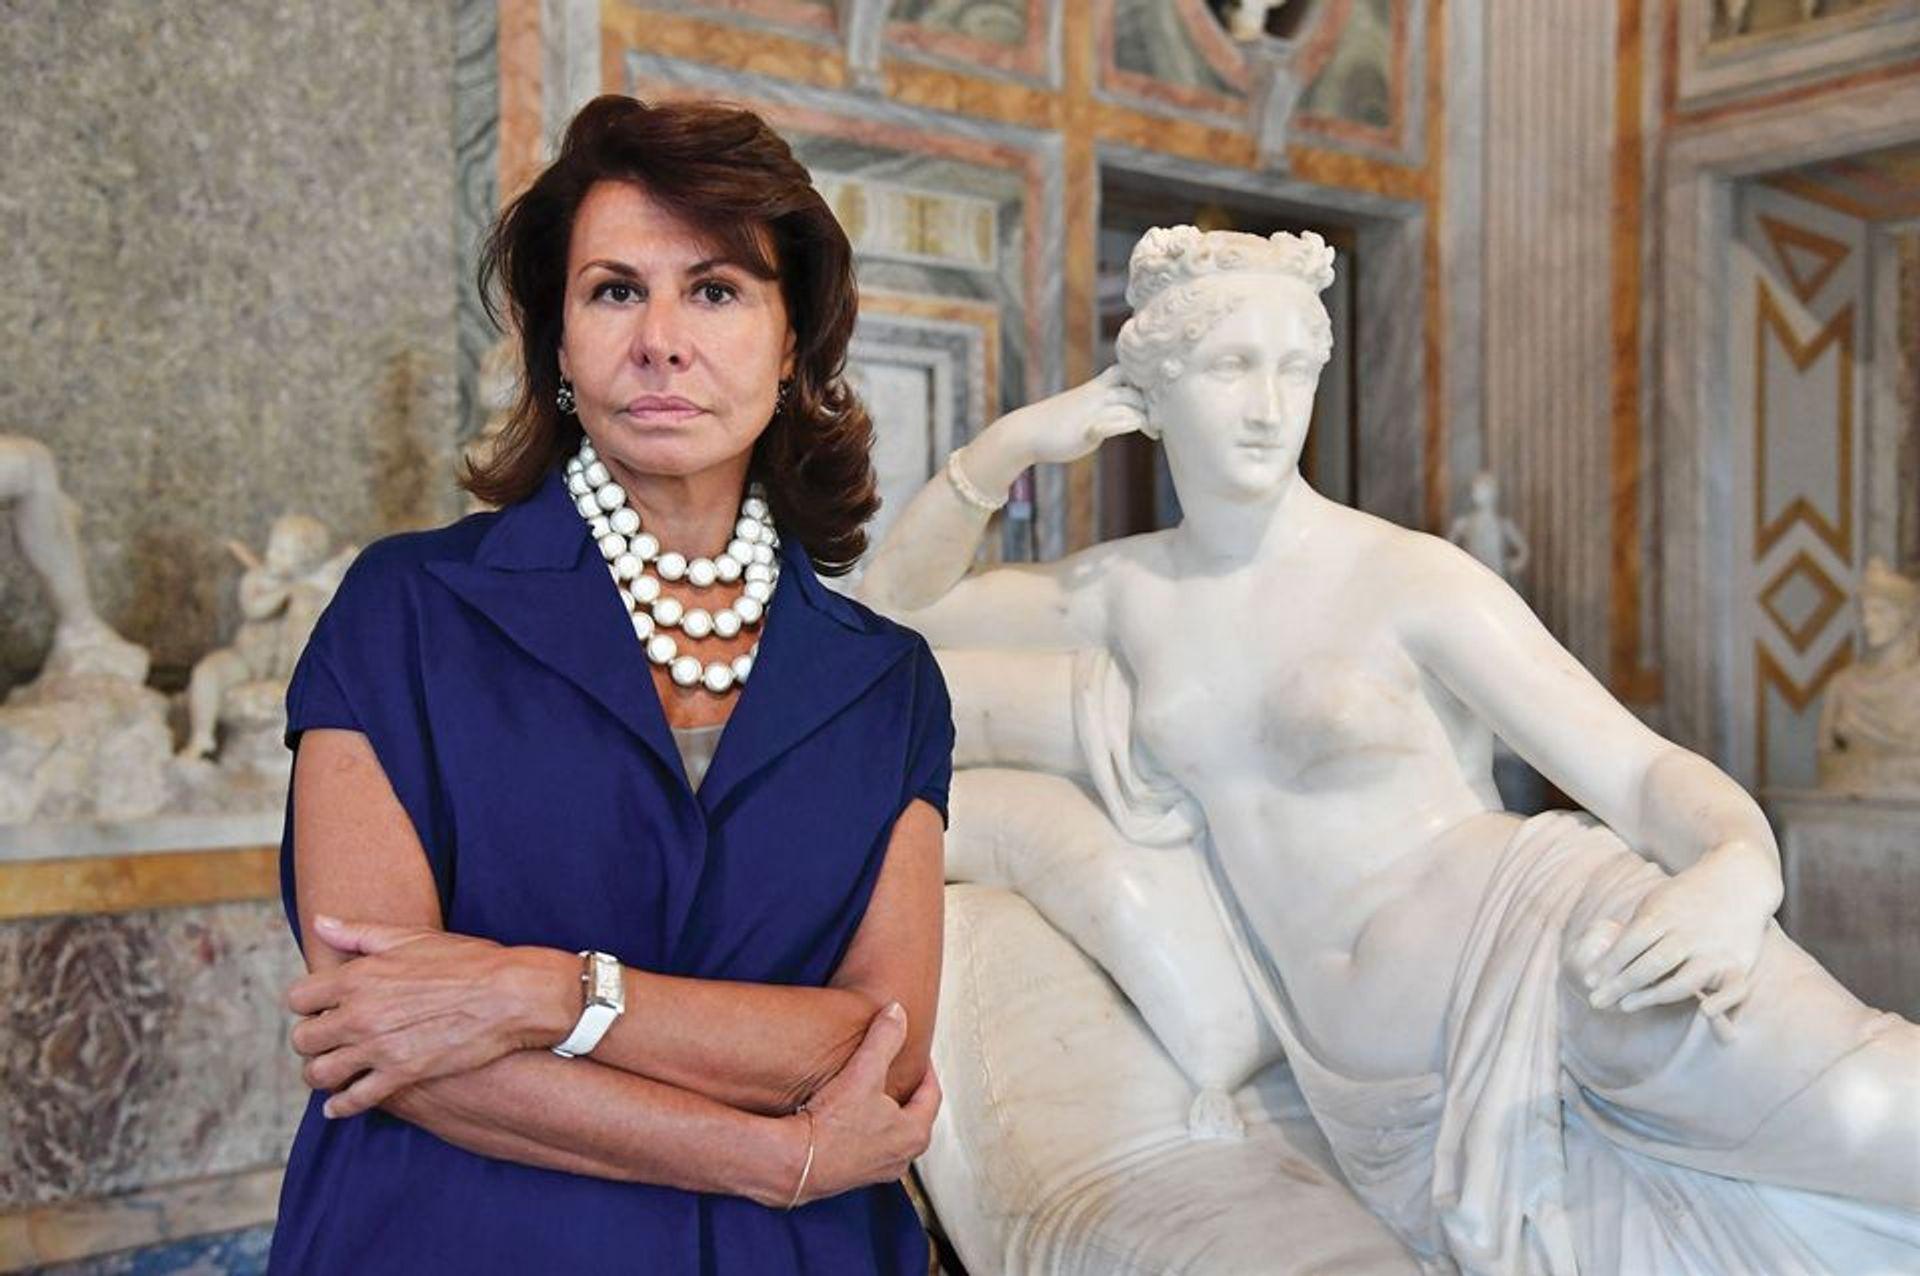 Anna Coliva has fallen foul of Italy's Kafka-esque bureaucracy Maria Laura Antonelli/Rex/Shutterstock